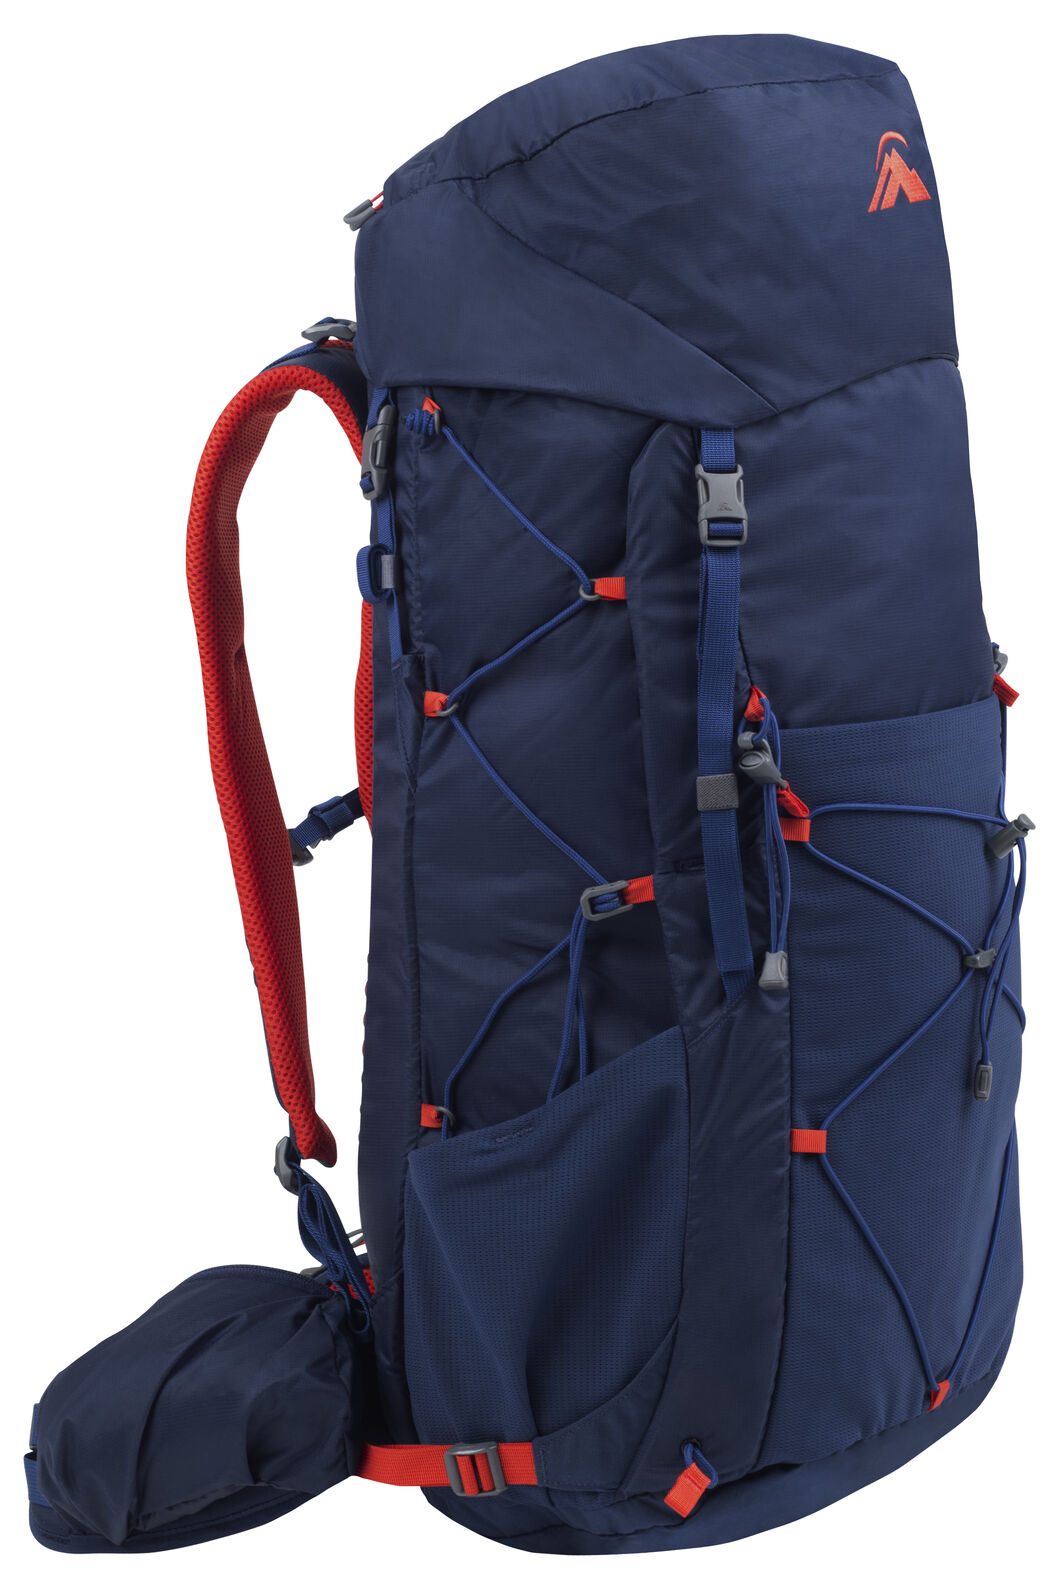 Macpac Fiord 1.1 40L Pack, Medieval Blue, hi-res